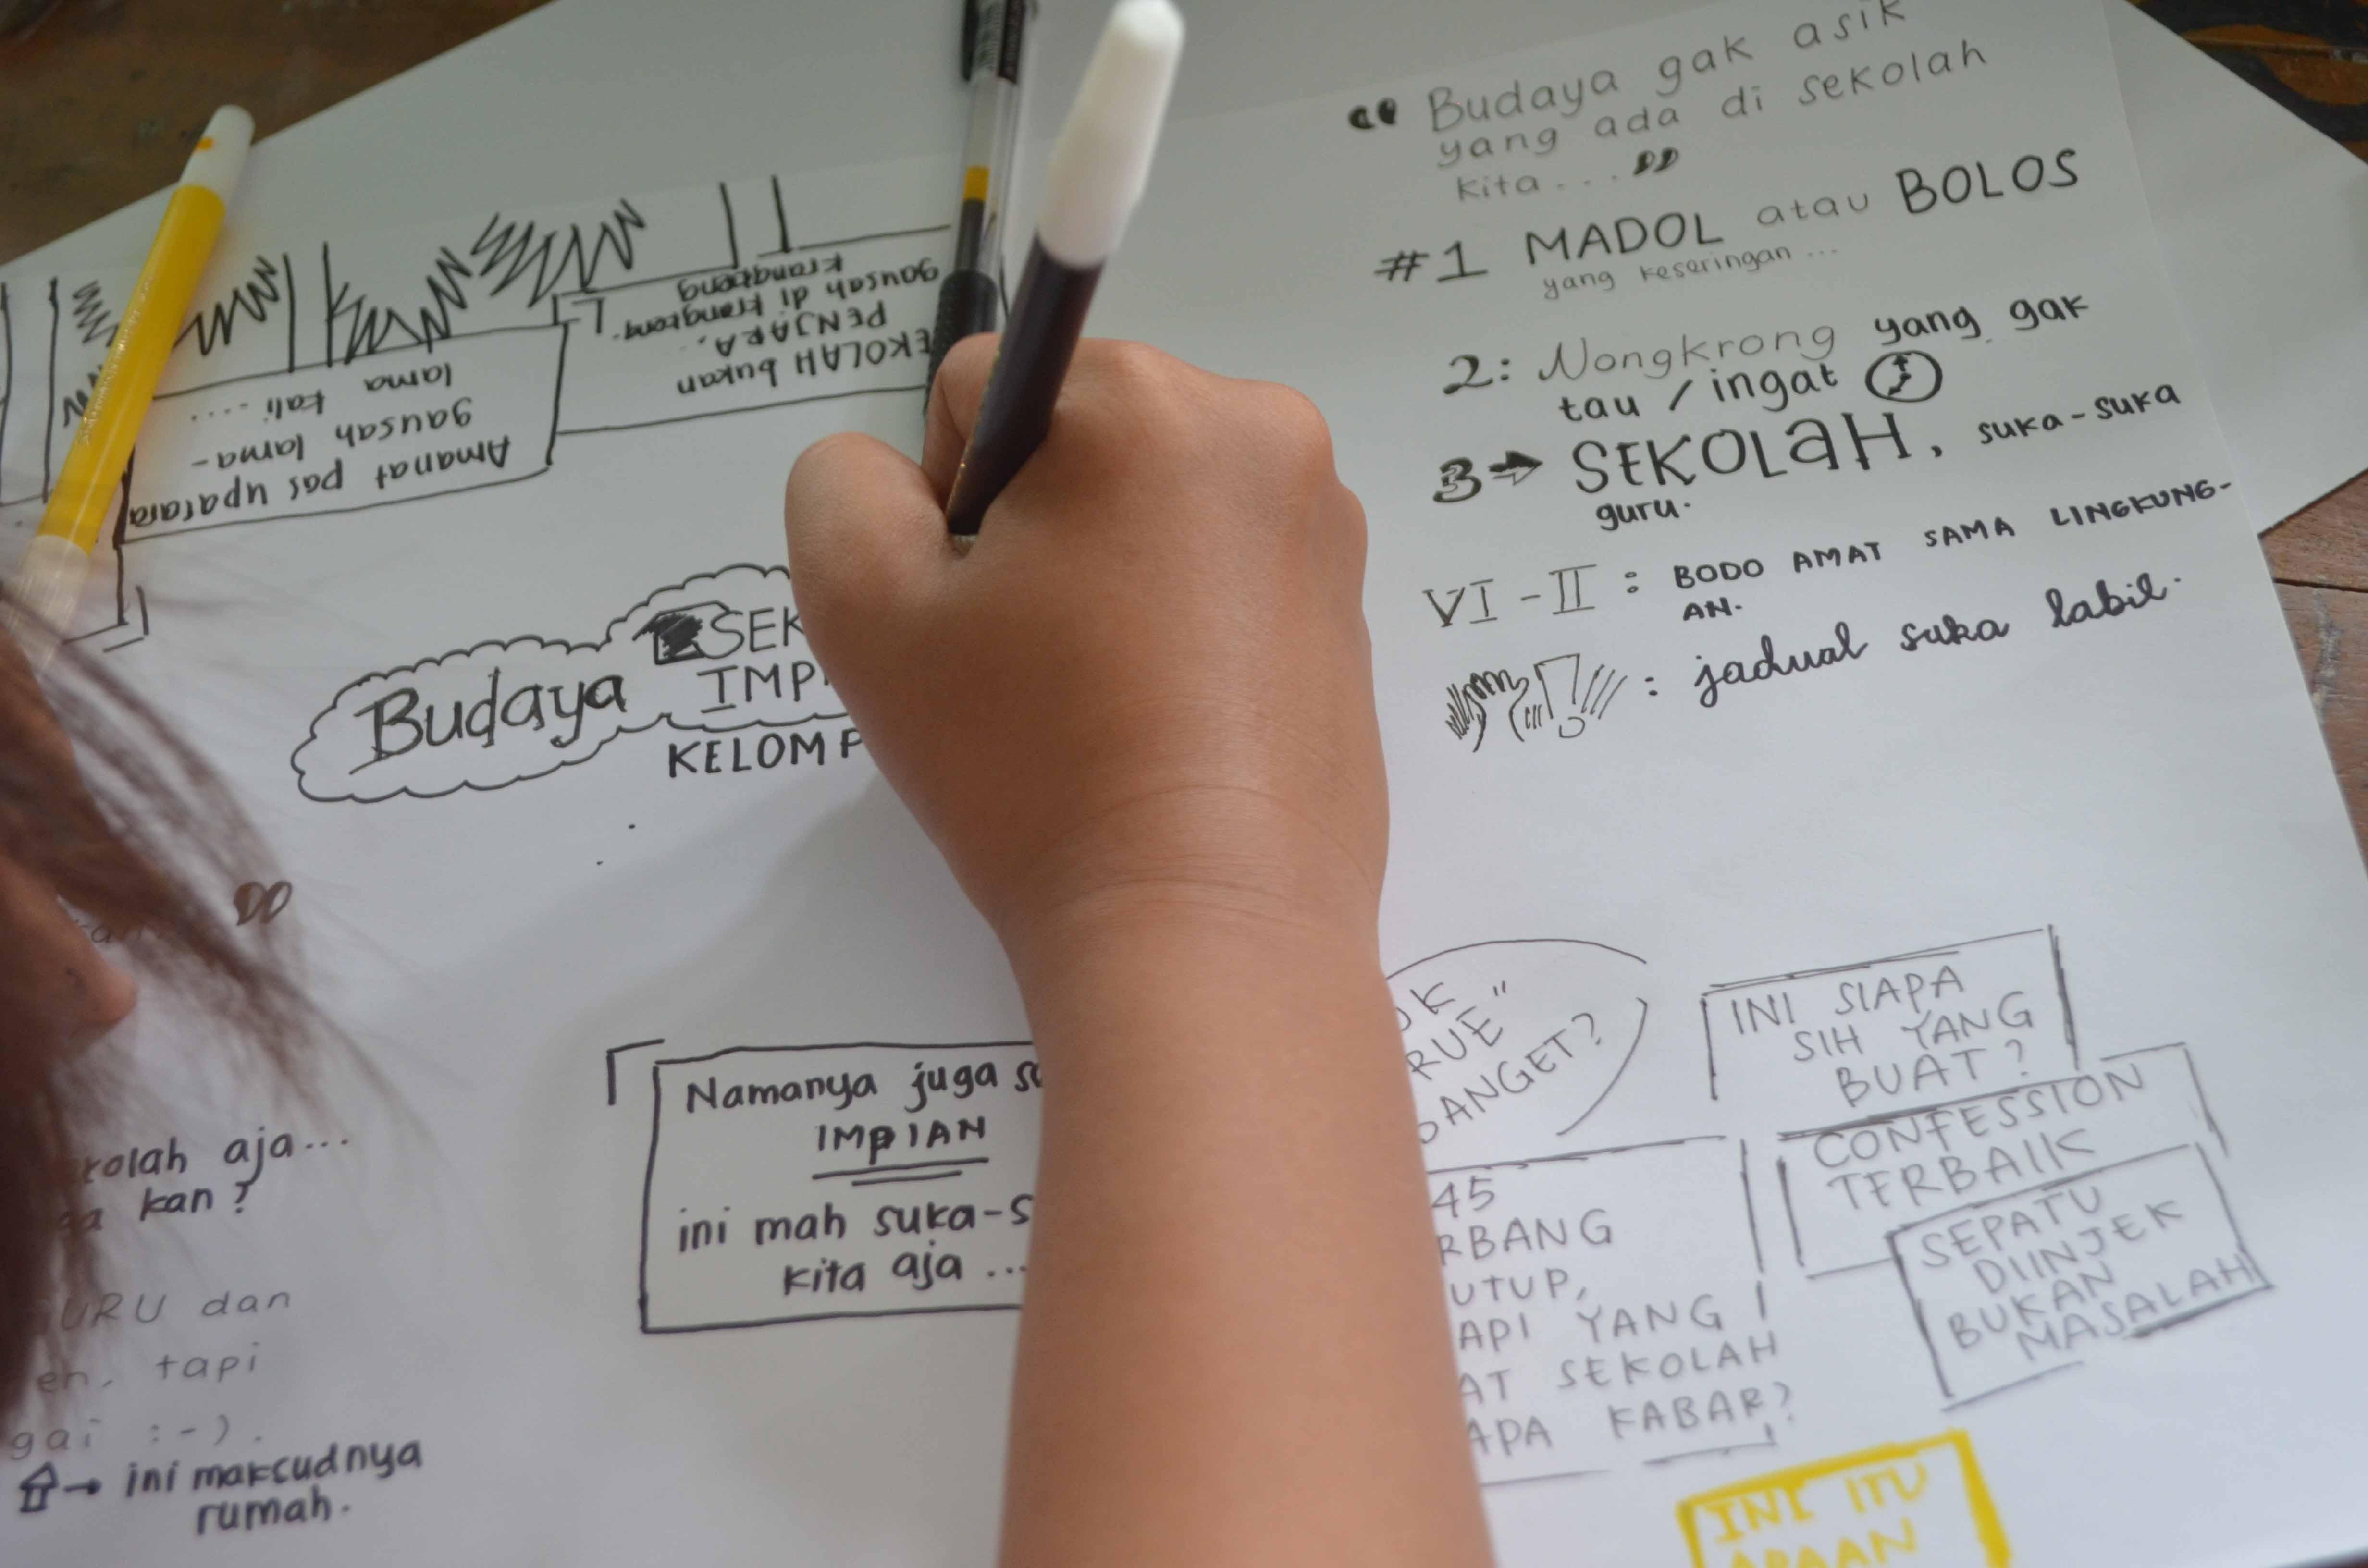 Sekolah Idaman_SMAN 7 Tangerang Selatan